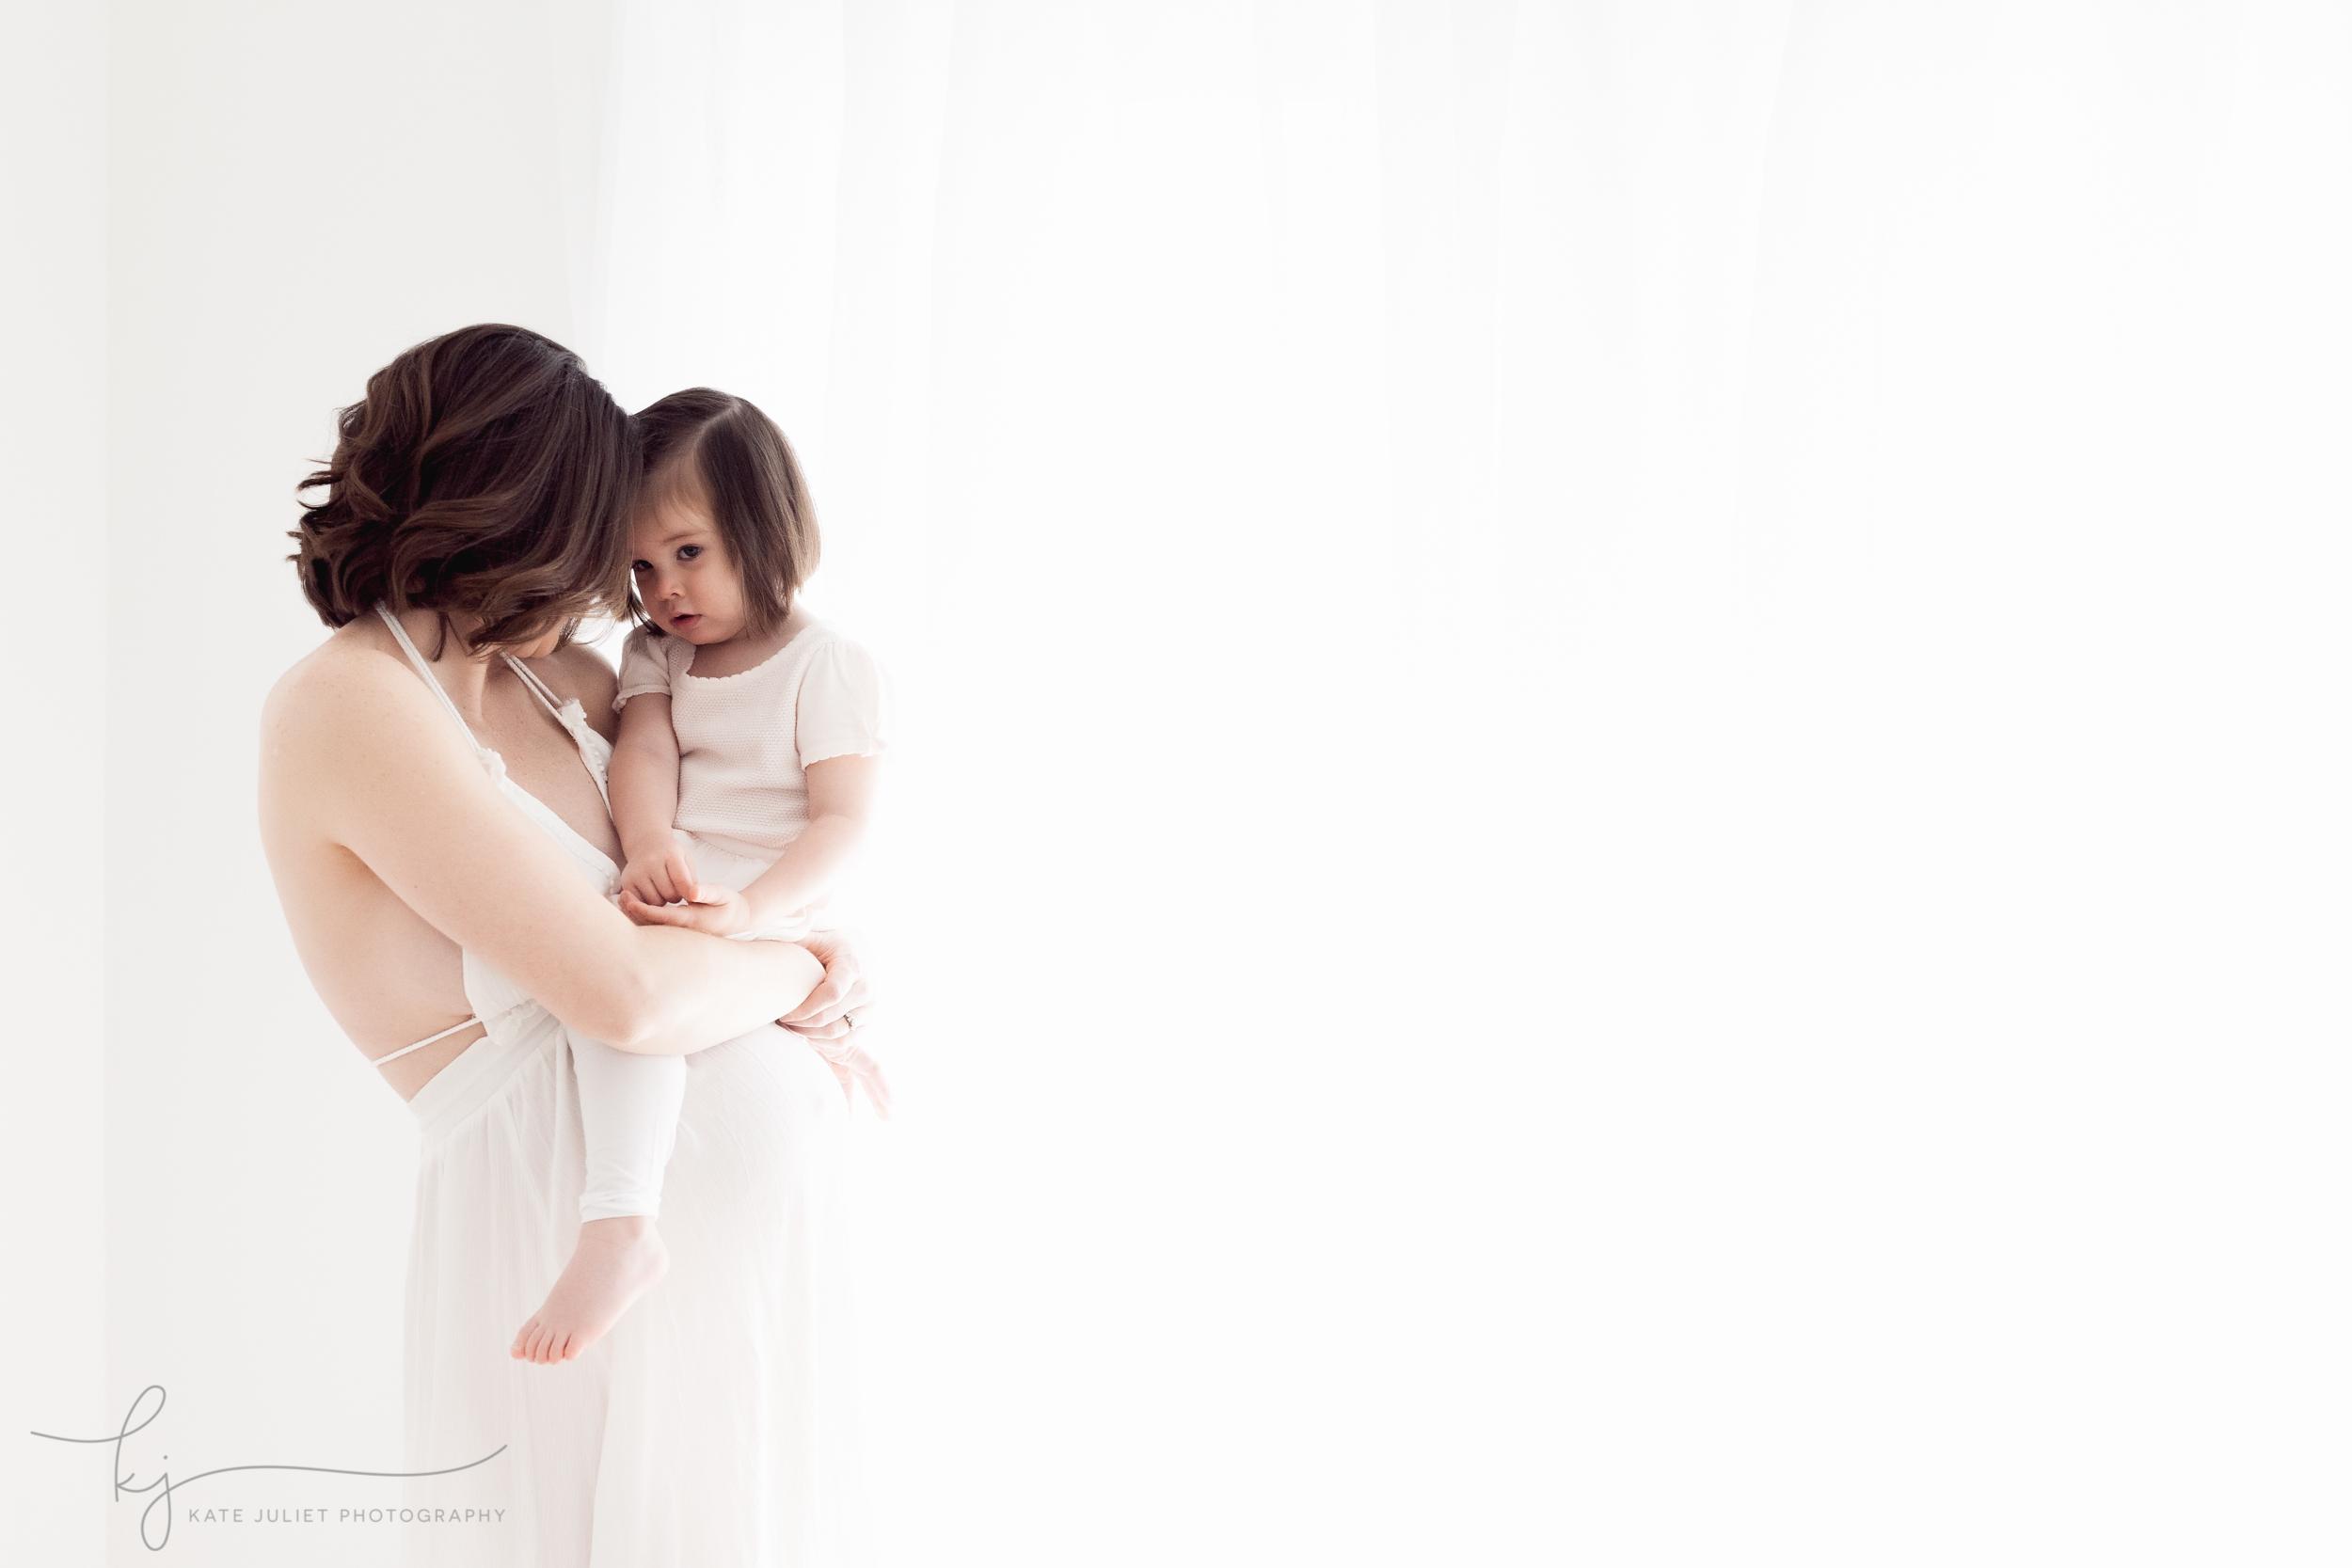 kate_juliet_photography_maternity_arlington_wm-053044.jpg